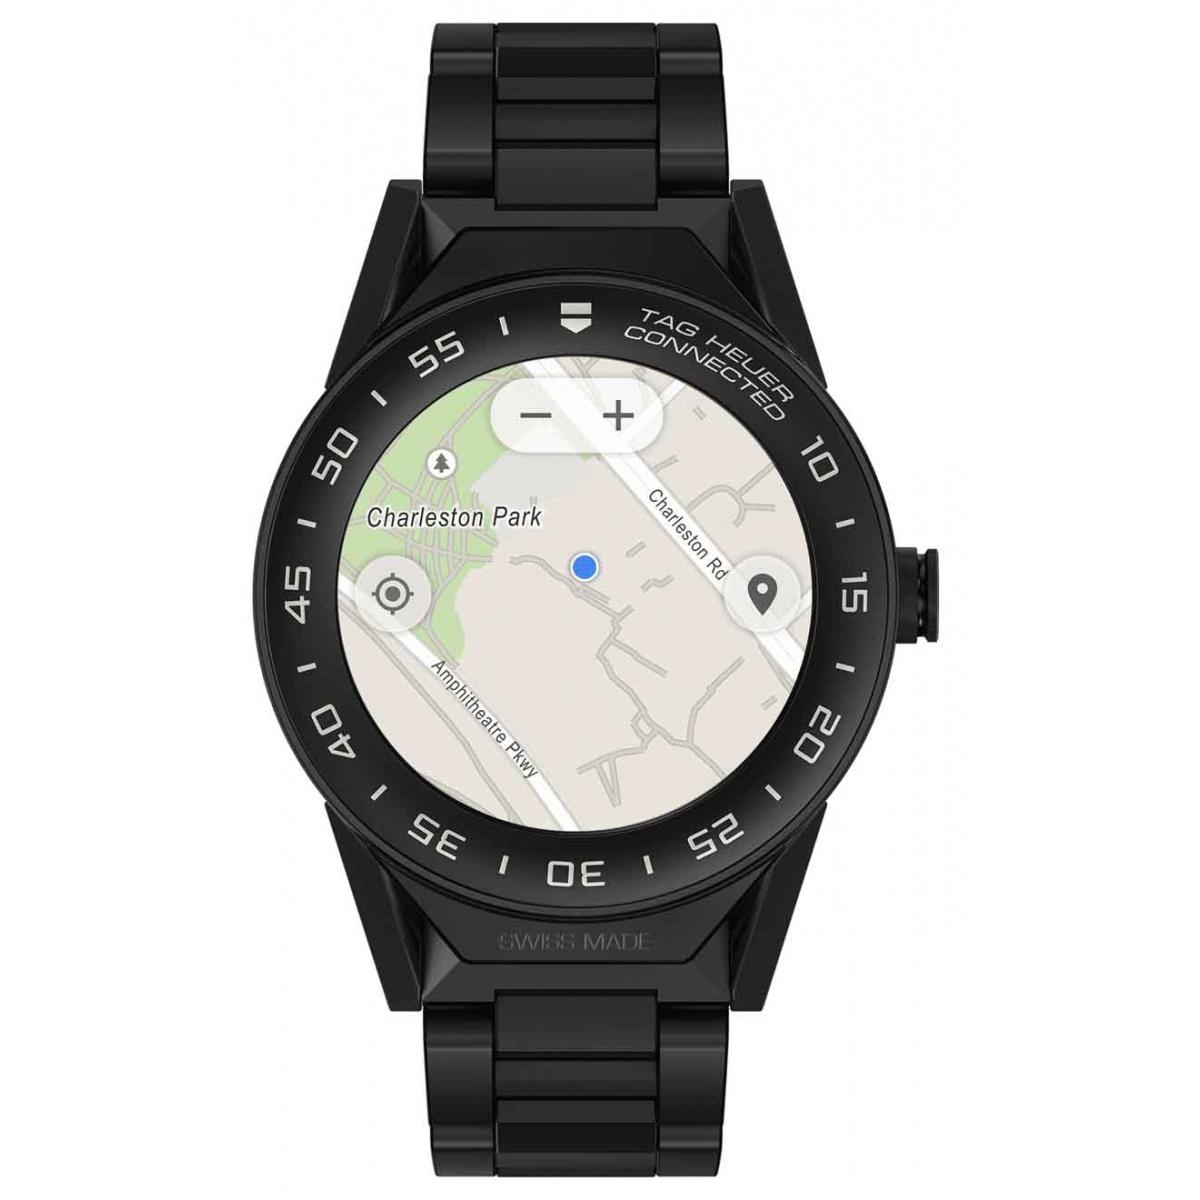 TAG HEUER CONNECTED MODULAR 41 50 M - ∅41 mm BLACK PVD TITANIUM, CERAMIC BLACK BEZEL, Matte black ceramic bracelet